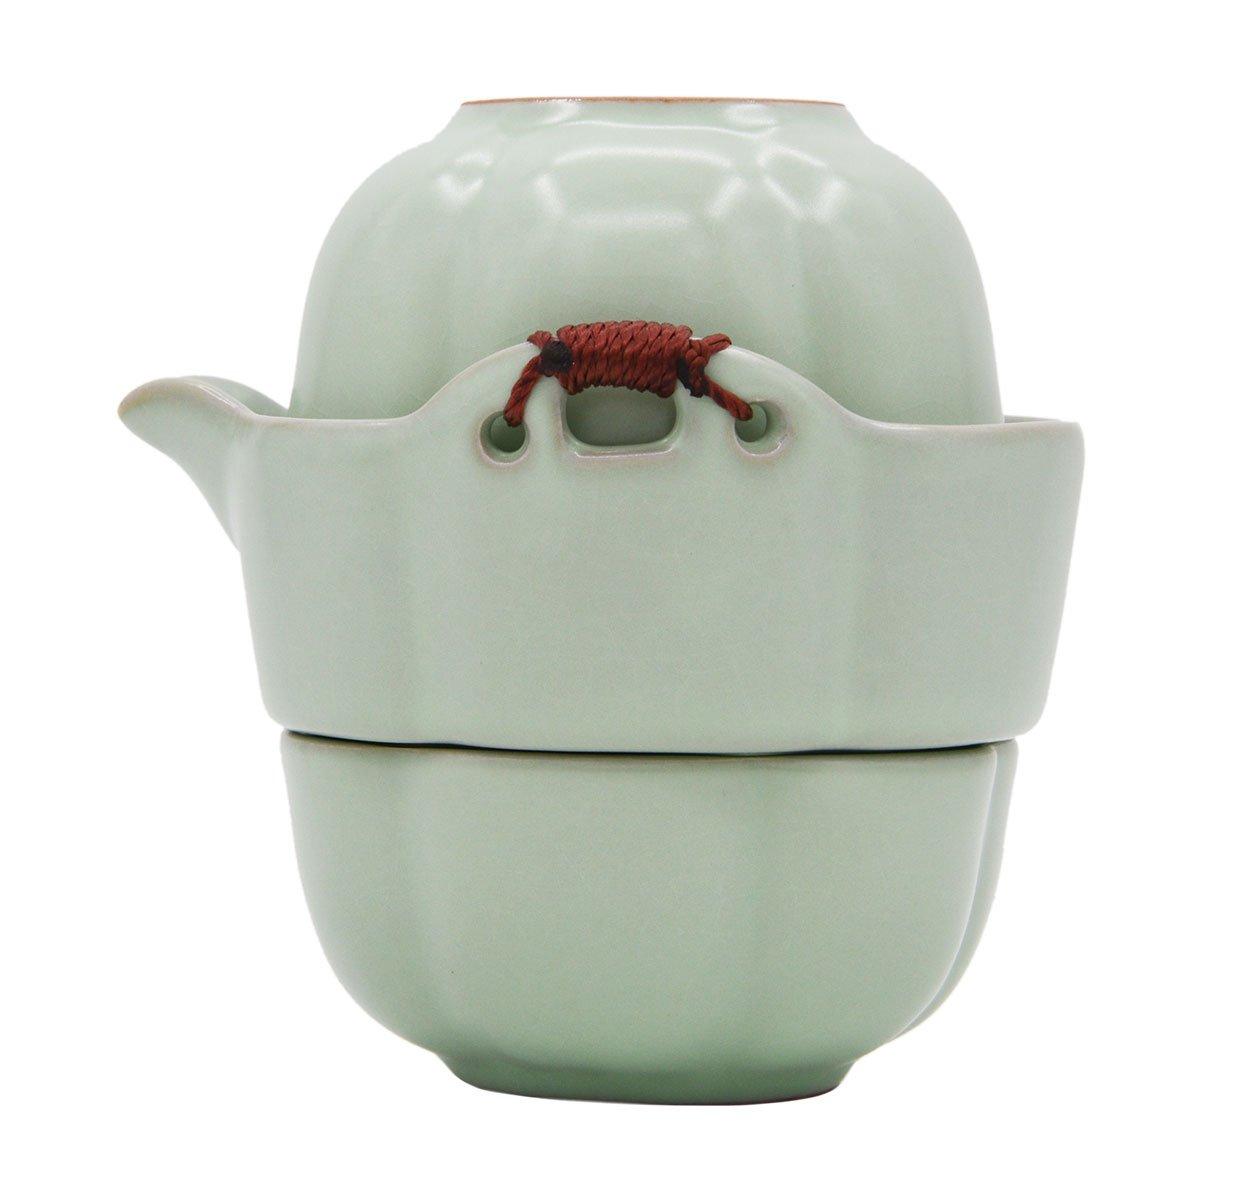 Vegali Double Ears Handmade Chinese Traditional Manual Kungfu/Gongfu Tea Set (Green-010)